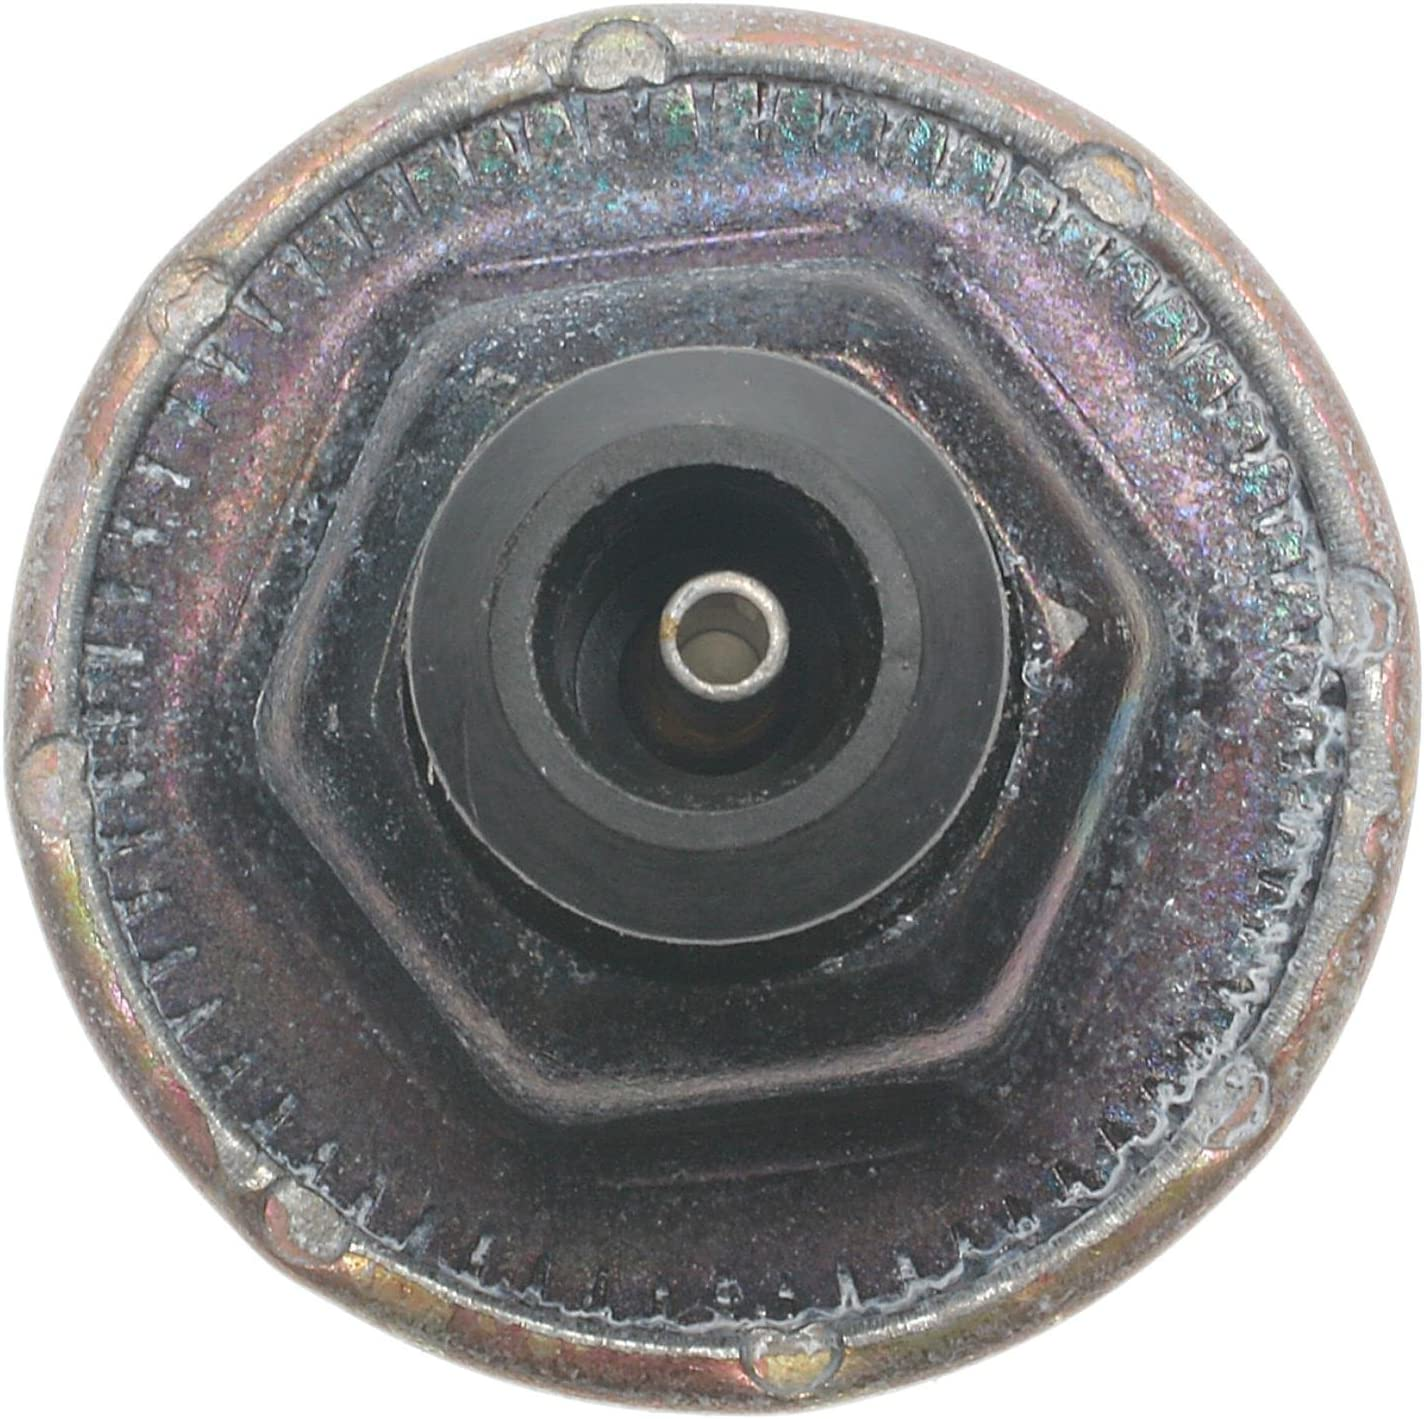 ACDelco 213-2804 Professional Ignition Knock Sensor Detonation